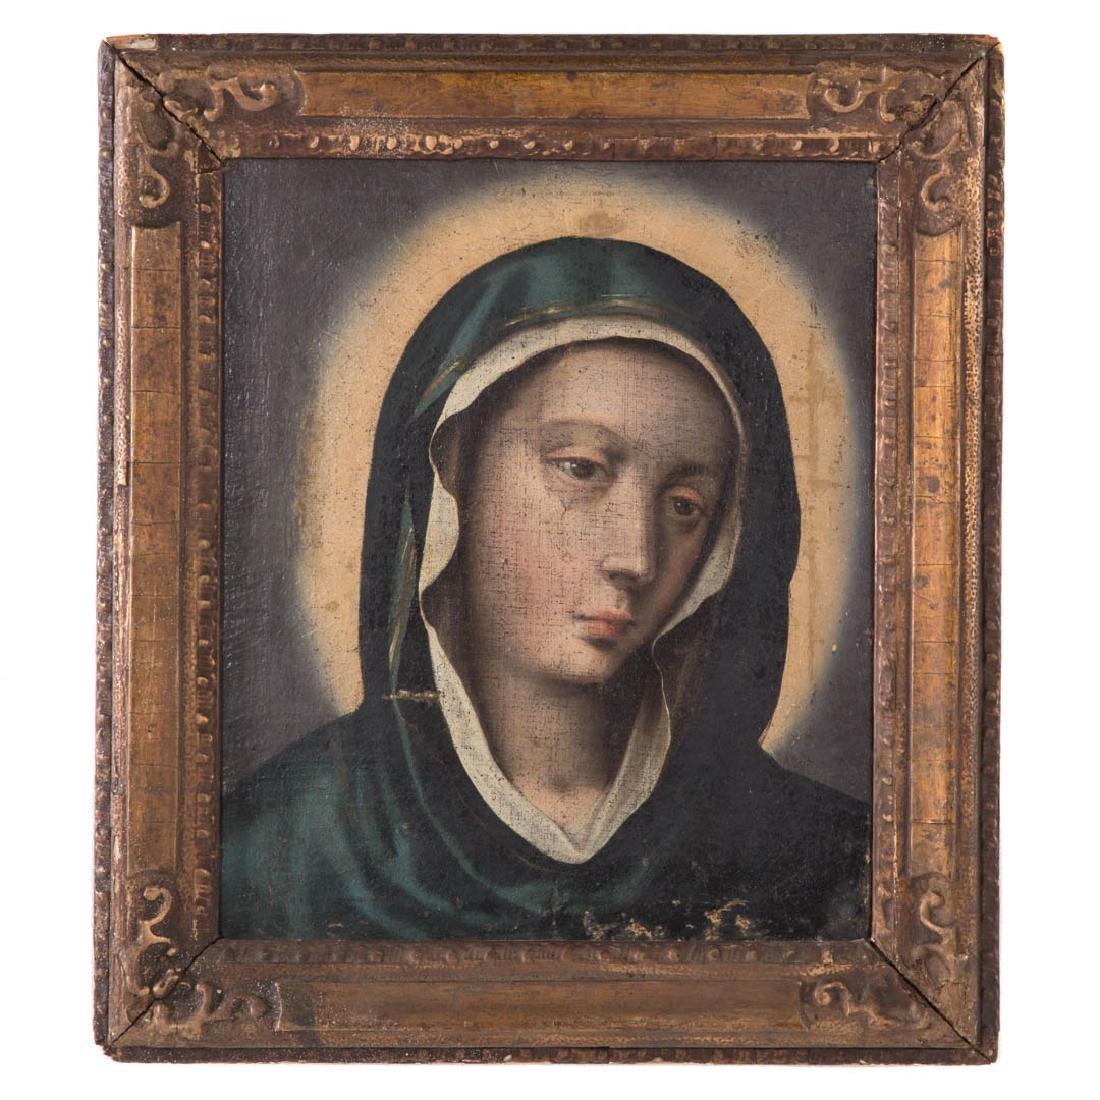 Italian School, 17th c. Head of the Madonna, oil